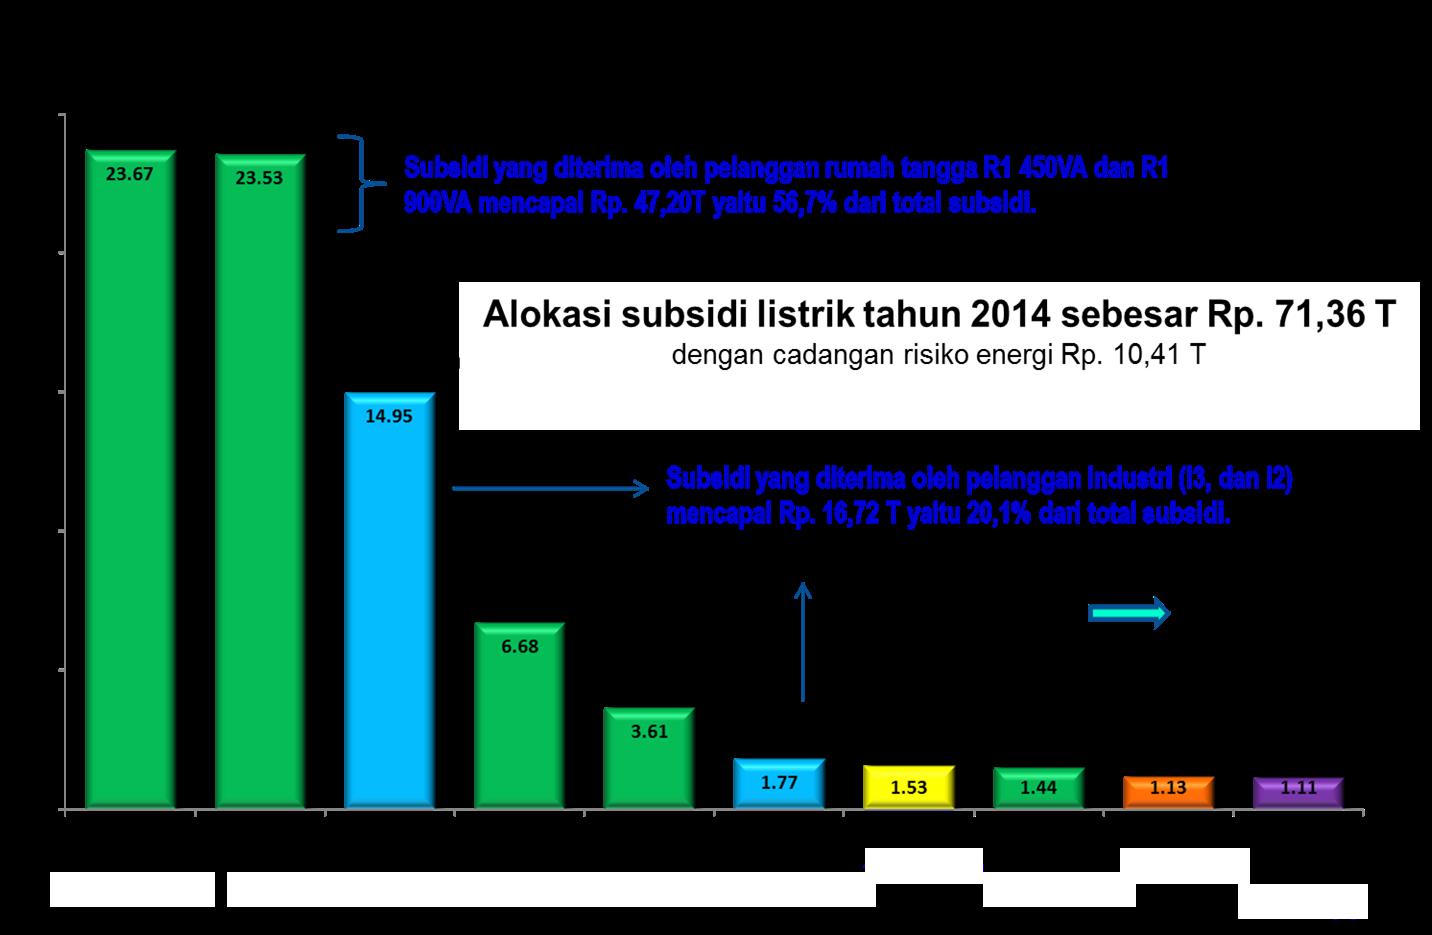 Penyesuaian tarif tenaga listrik untuk industri menengah dan besar dalam grafik diatas pemerintah berupa agar anggaran subsidi listrik untuk tahun 2014 ini tepat sasaran yaitu harus lebih besar komposisi penerima subsidi ccuart Choice Image